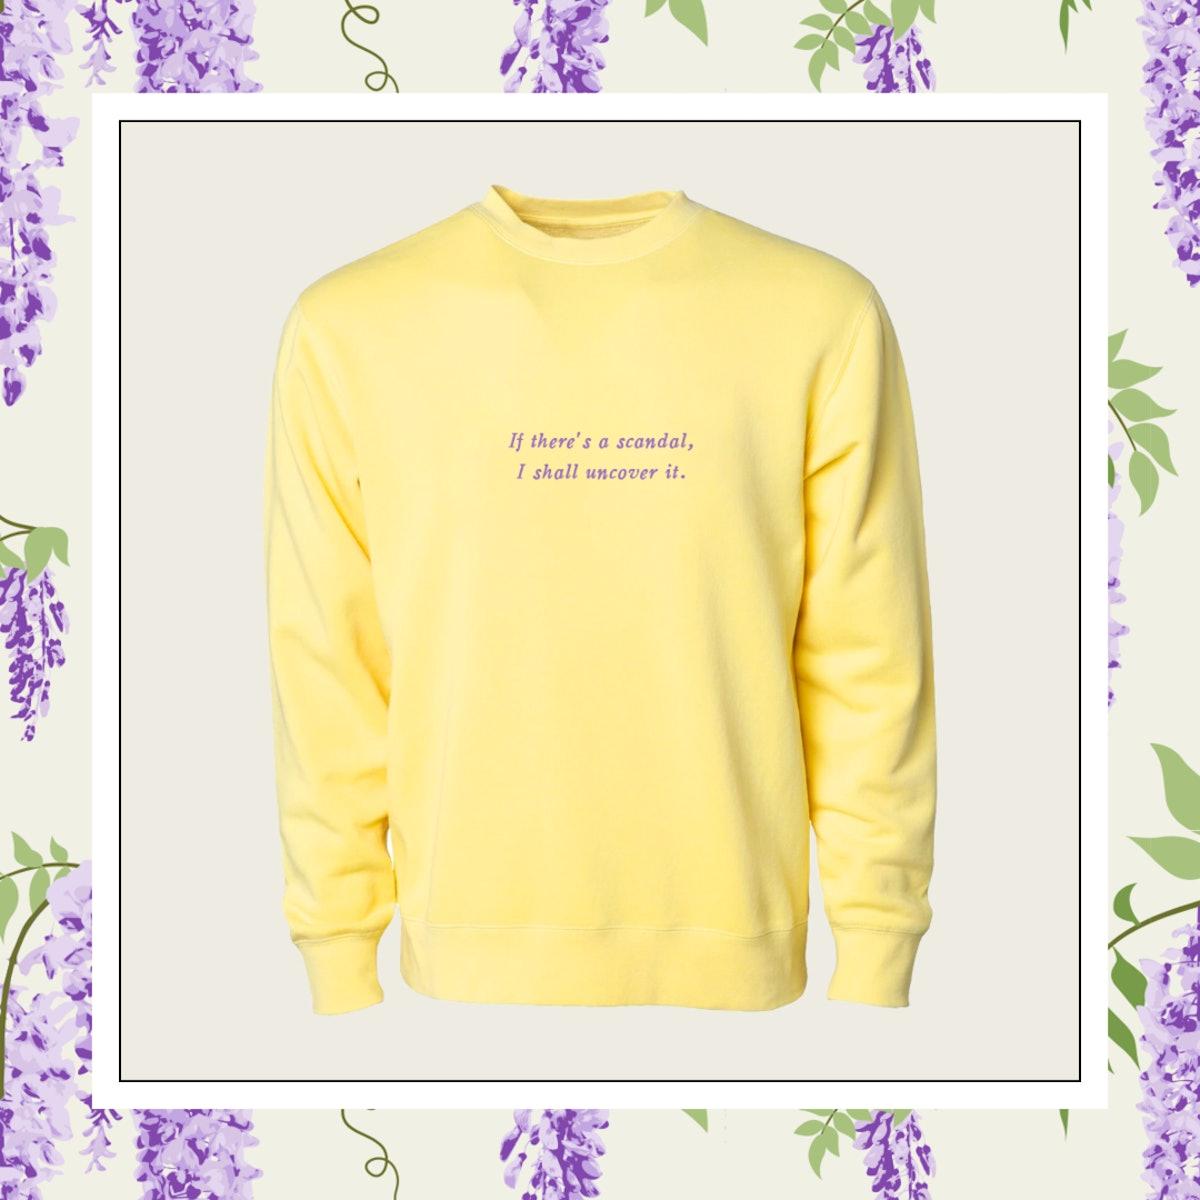 Phenomenal x Bridgerton Collab (If There's A Scandal, I Shall Uncover It) Crewneck Sweatshirt